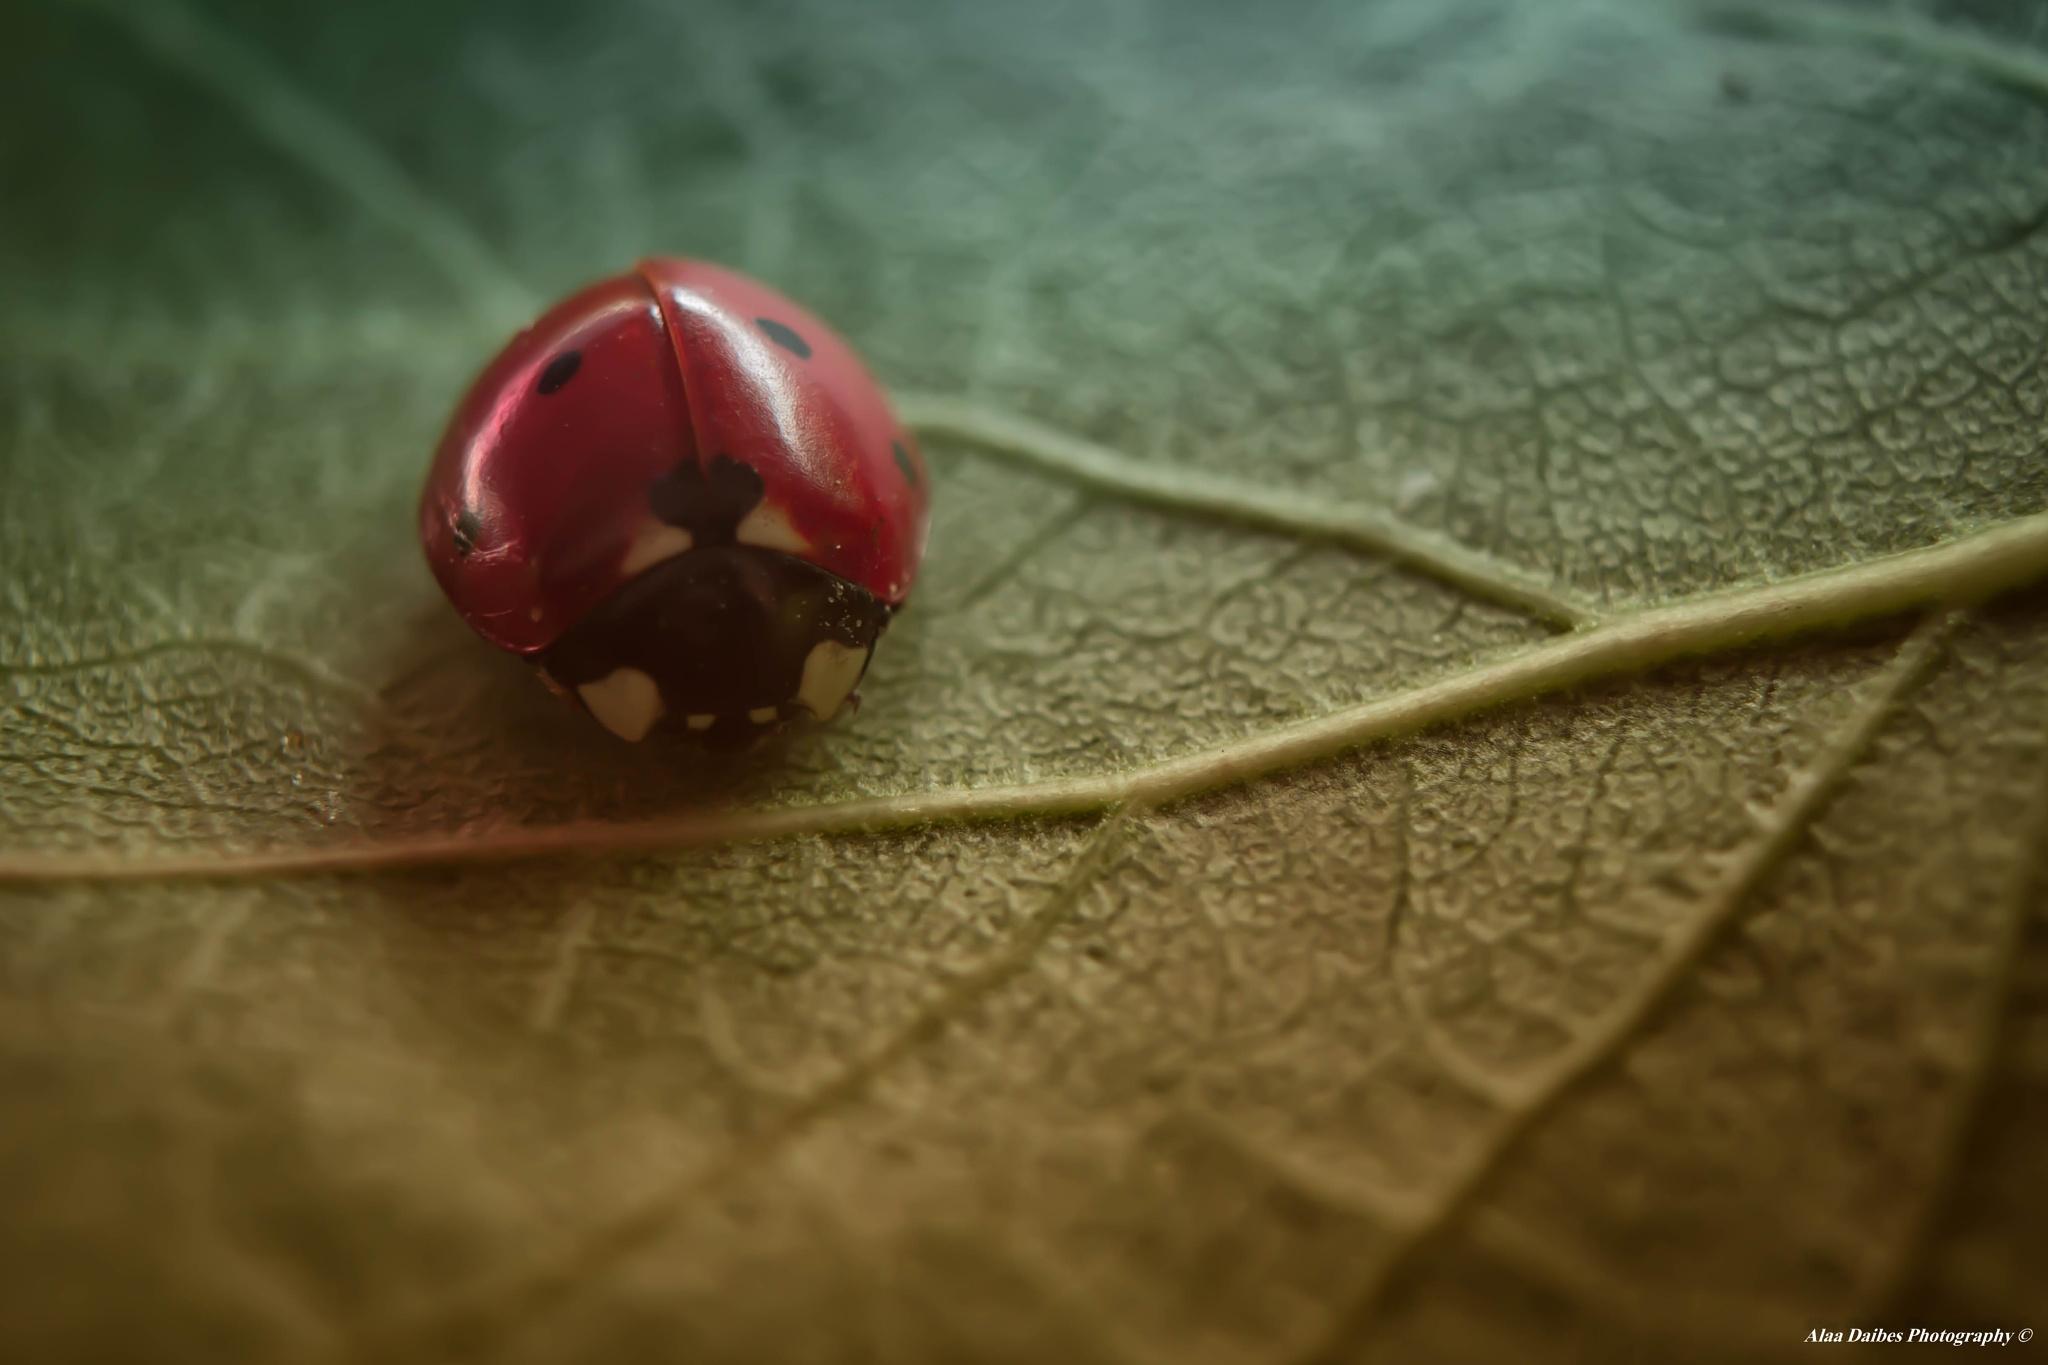 Between Spring & Autumn by Alaa